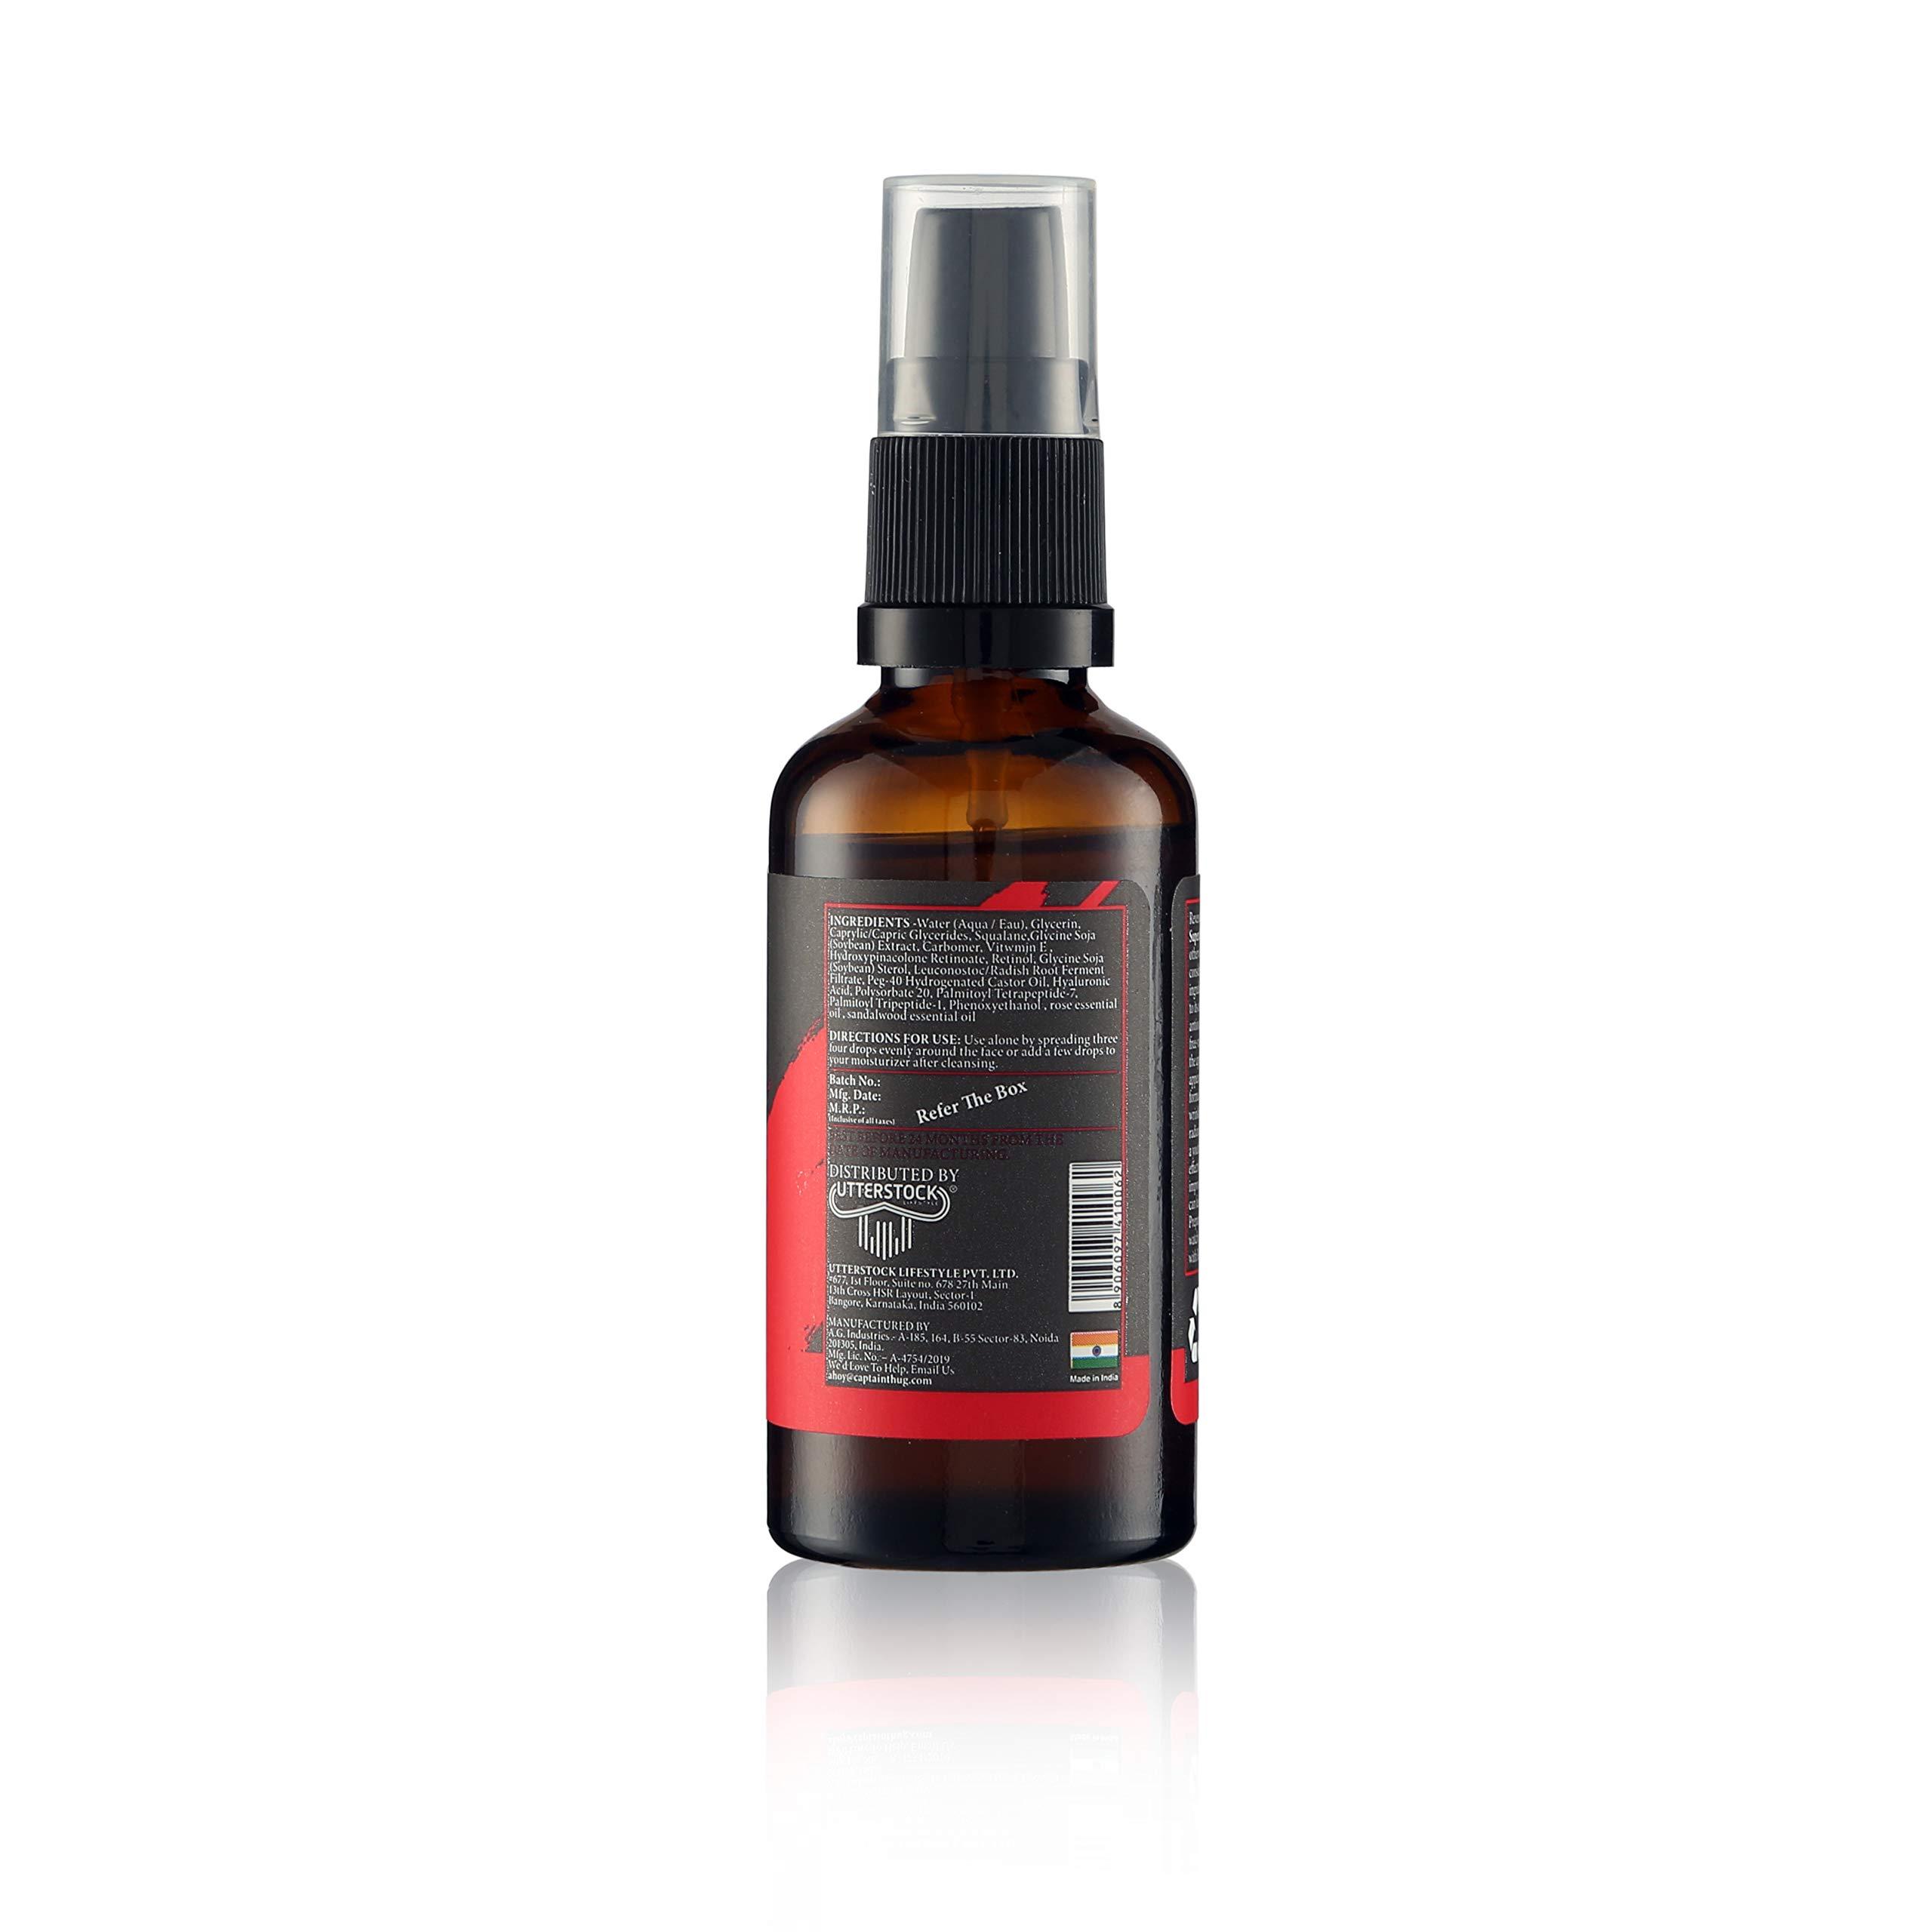 Redux Supercharged Retinol + Vitamin E & Hyaluronic Acid, Facial Serum - 1.7 fl oz - Anti Aging/Wrinkle Serum